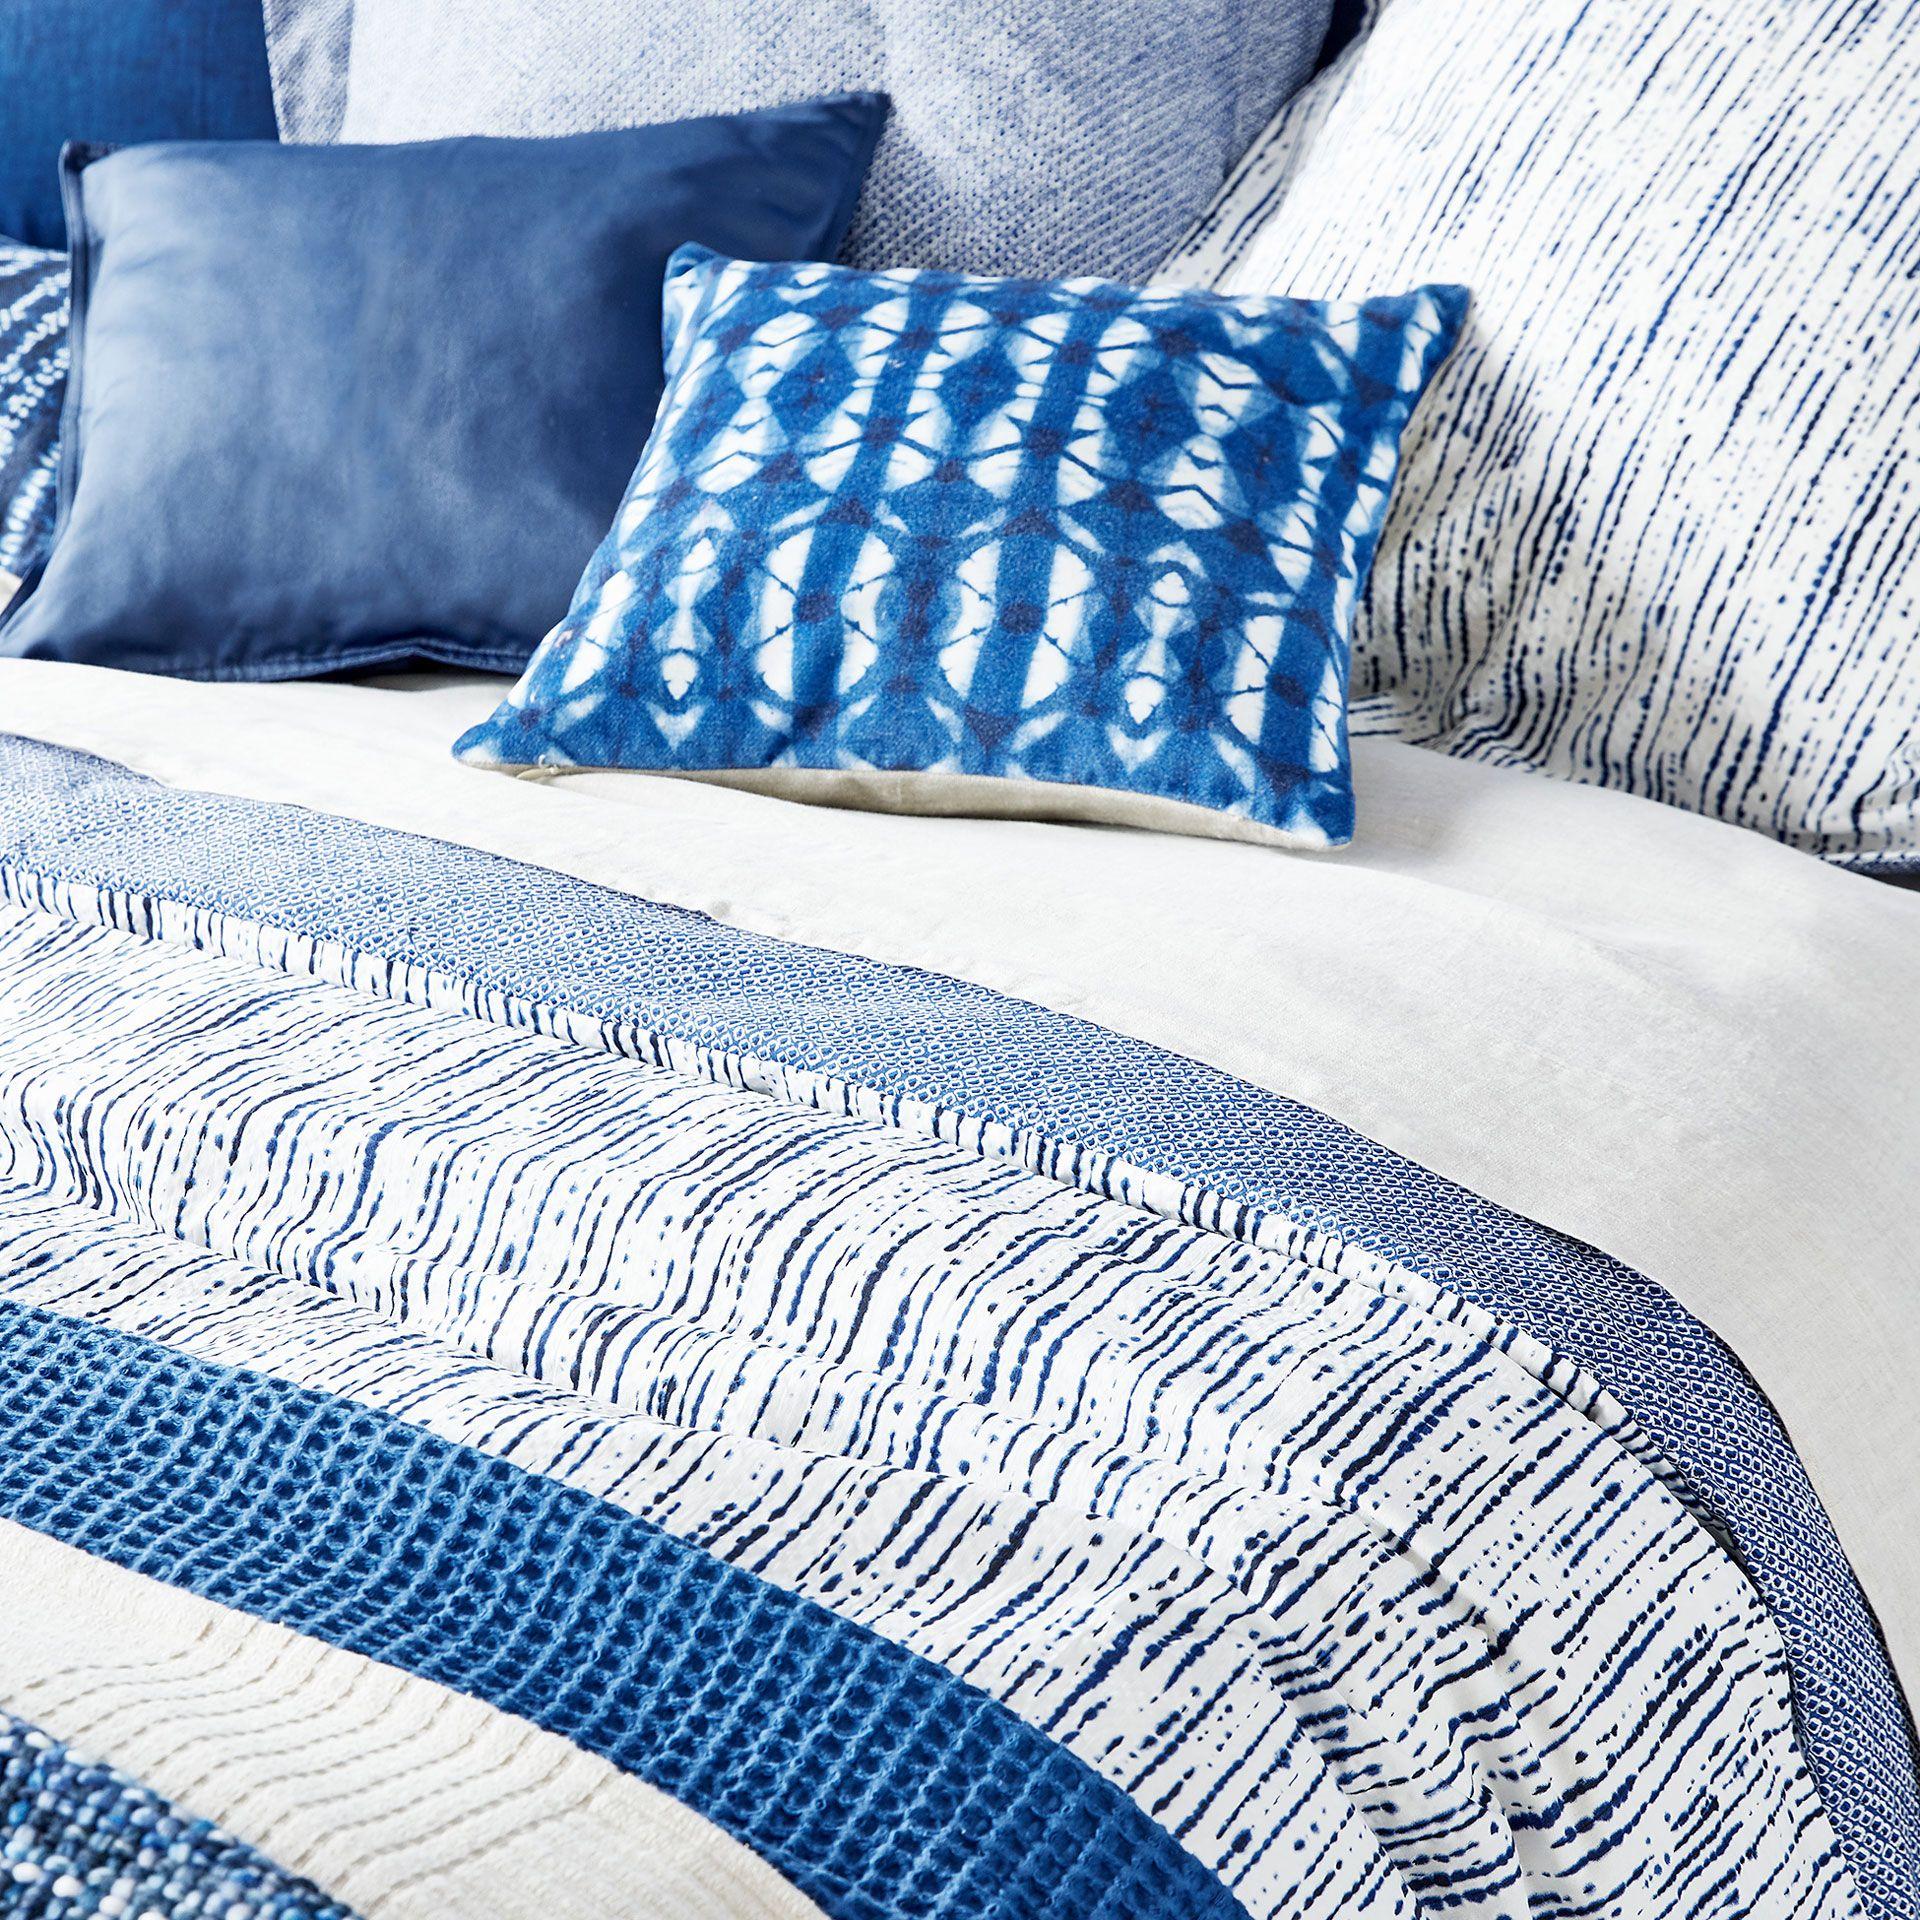 duvet cover wayfair collection bed seersucker pdx bath bedding elizabeth reviews home amity